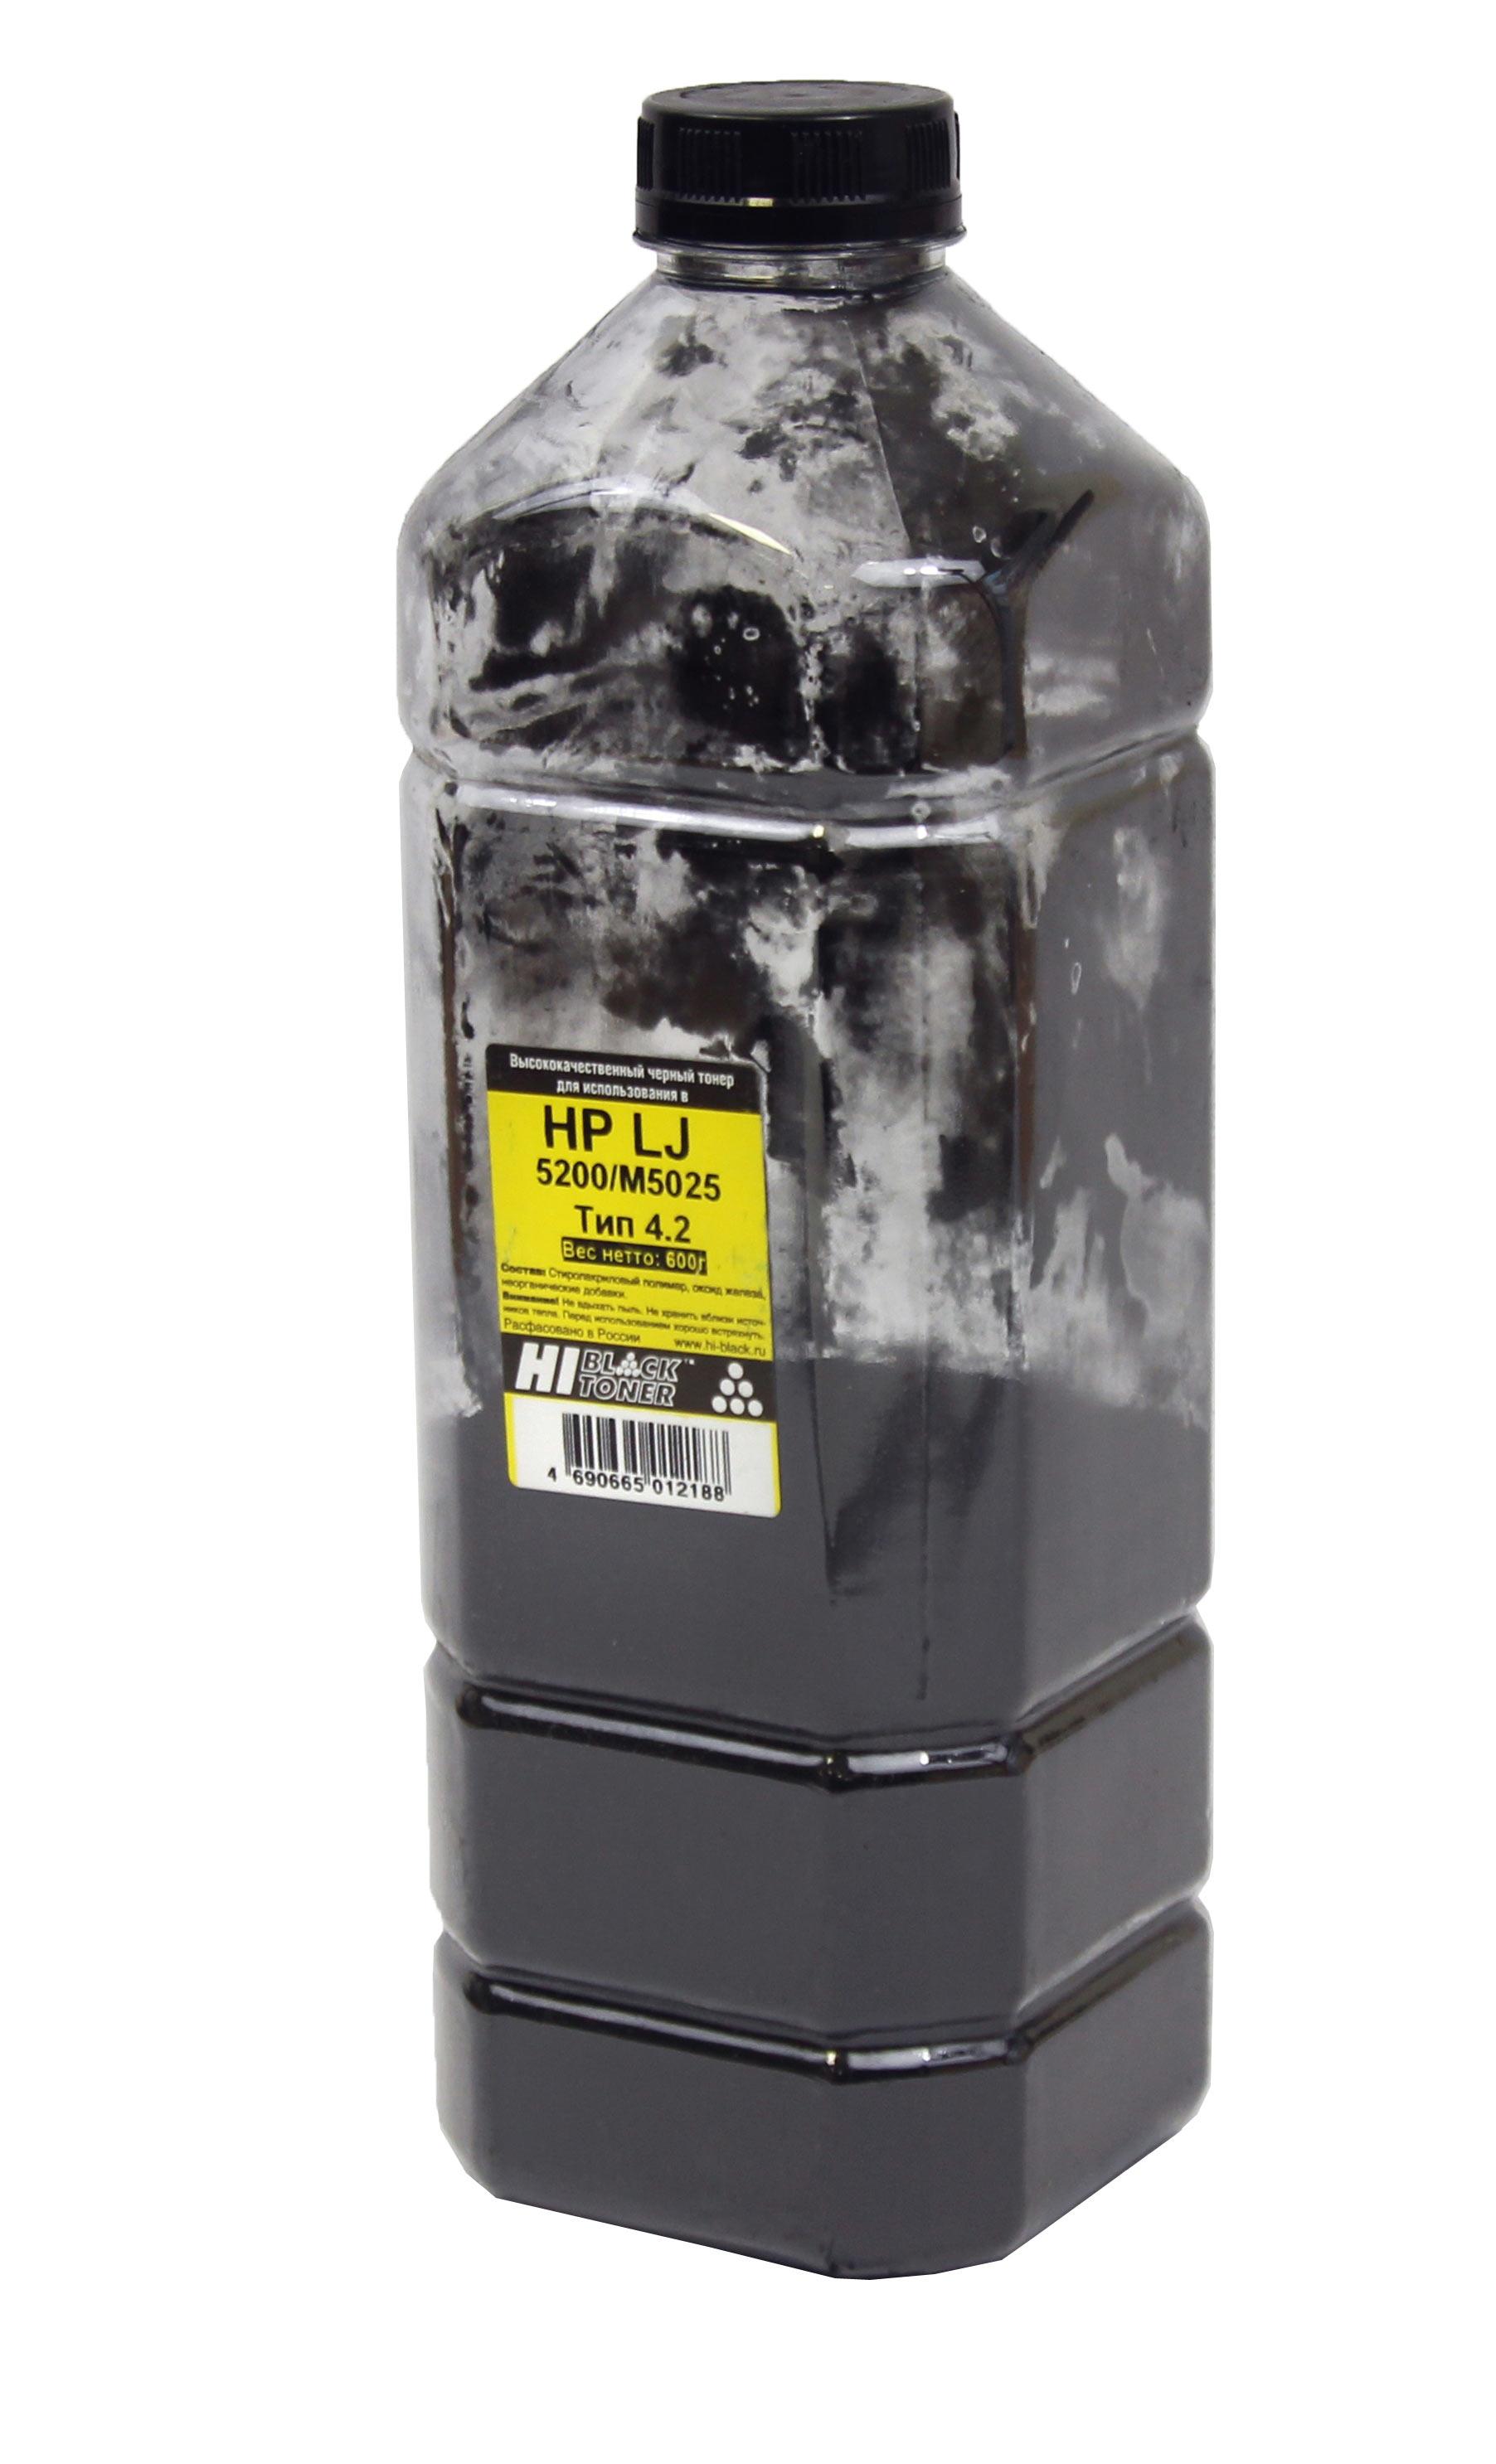 Тонер Hi-Black для HP LJ 5200/M5025, Тип 4.2, Bk, 600 г, канистра